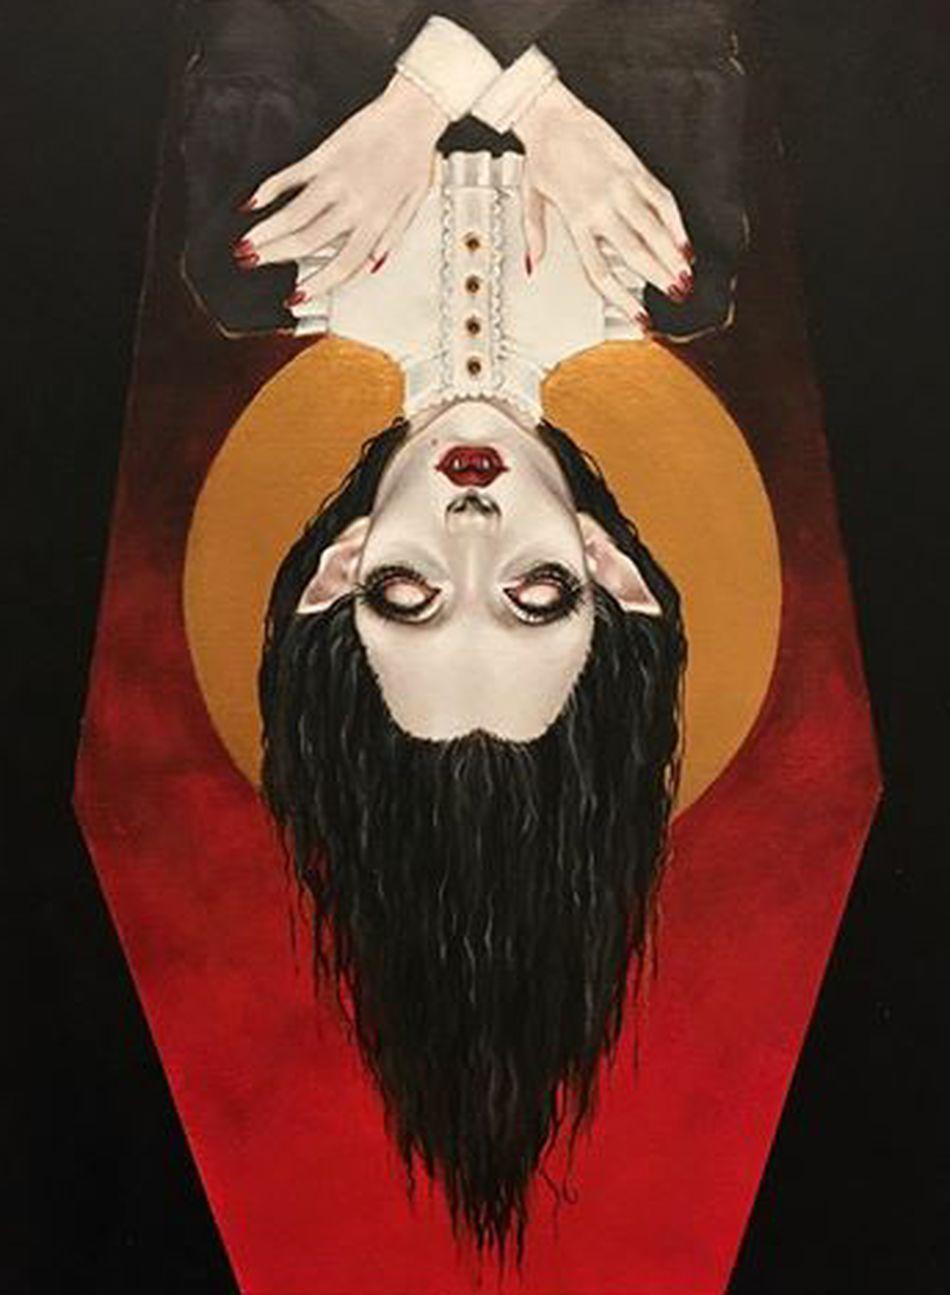 Vampire Vampires Painting Horror Portrait Paitings Vampiregirl Finishedwork MyArt Mypainting Mypaint Paintwork Macabre Art